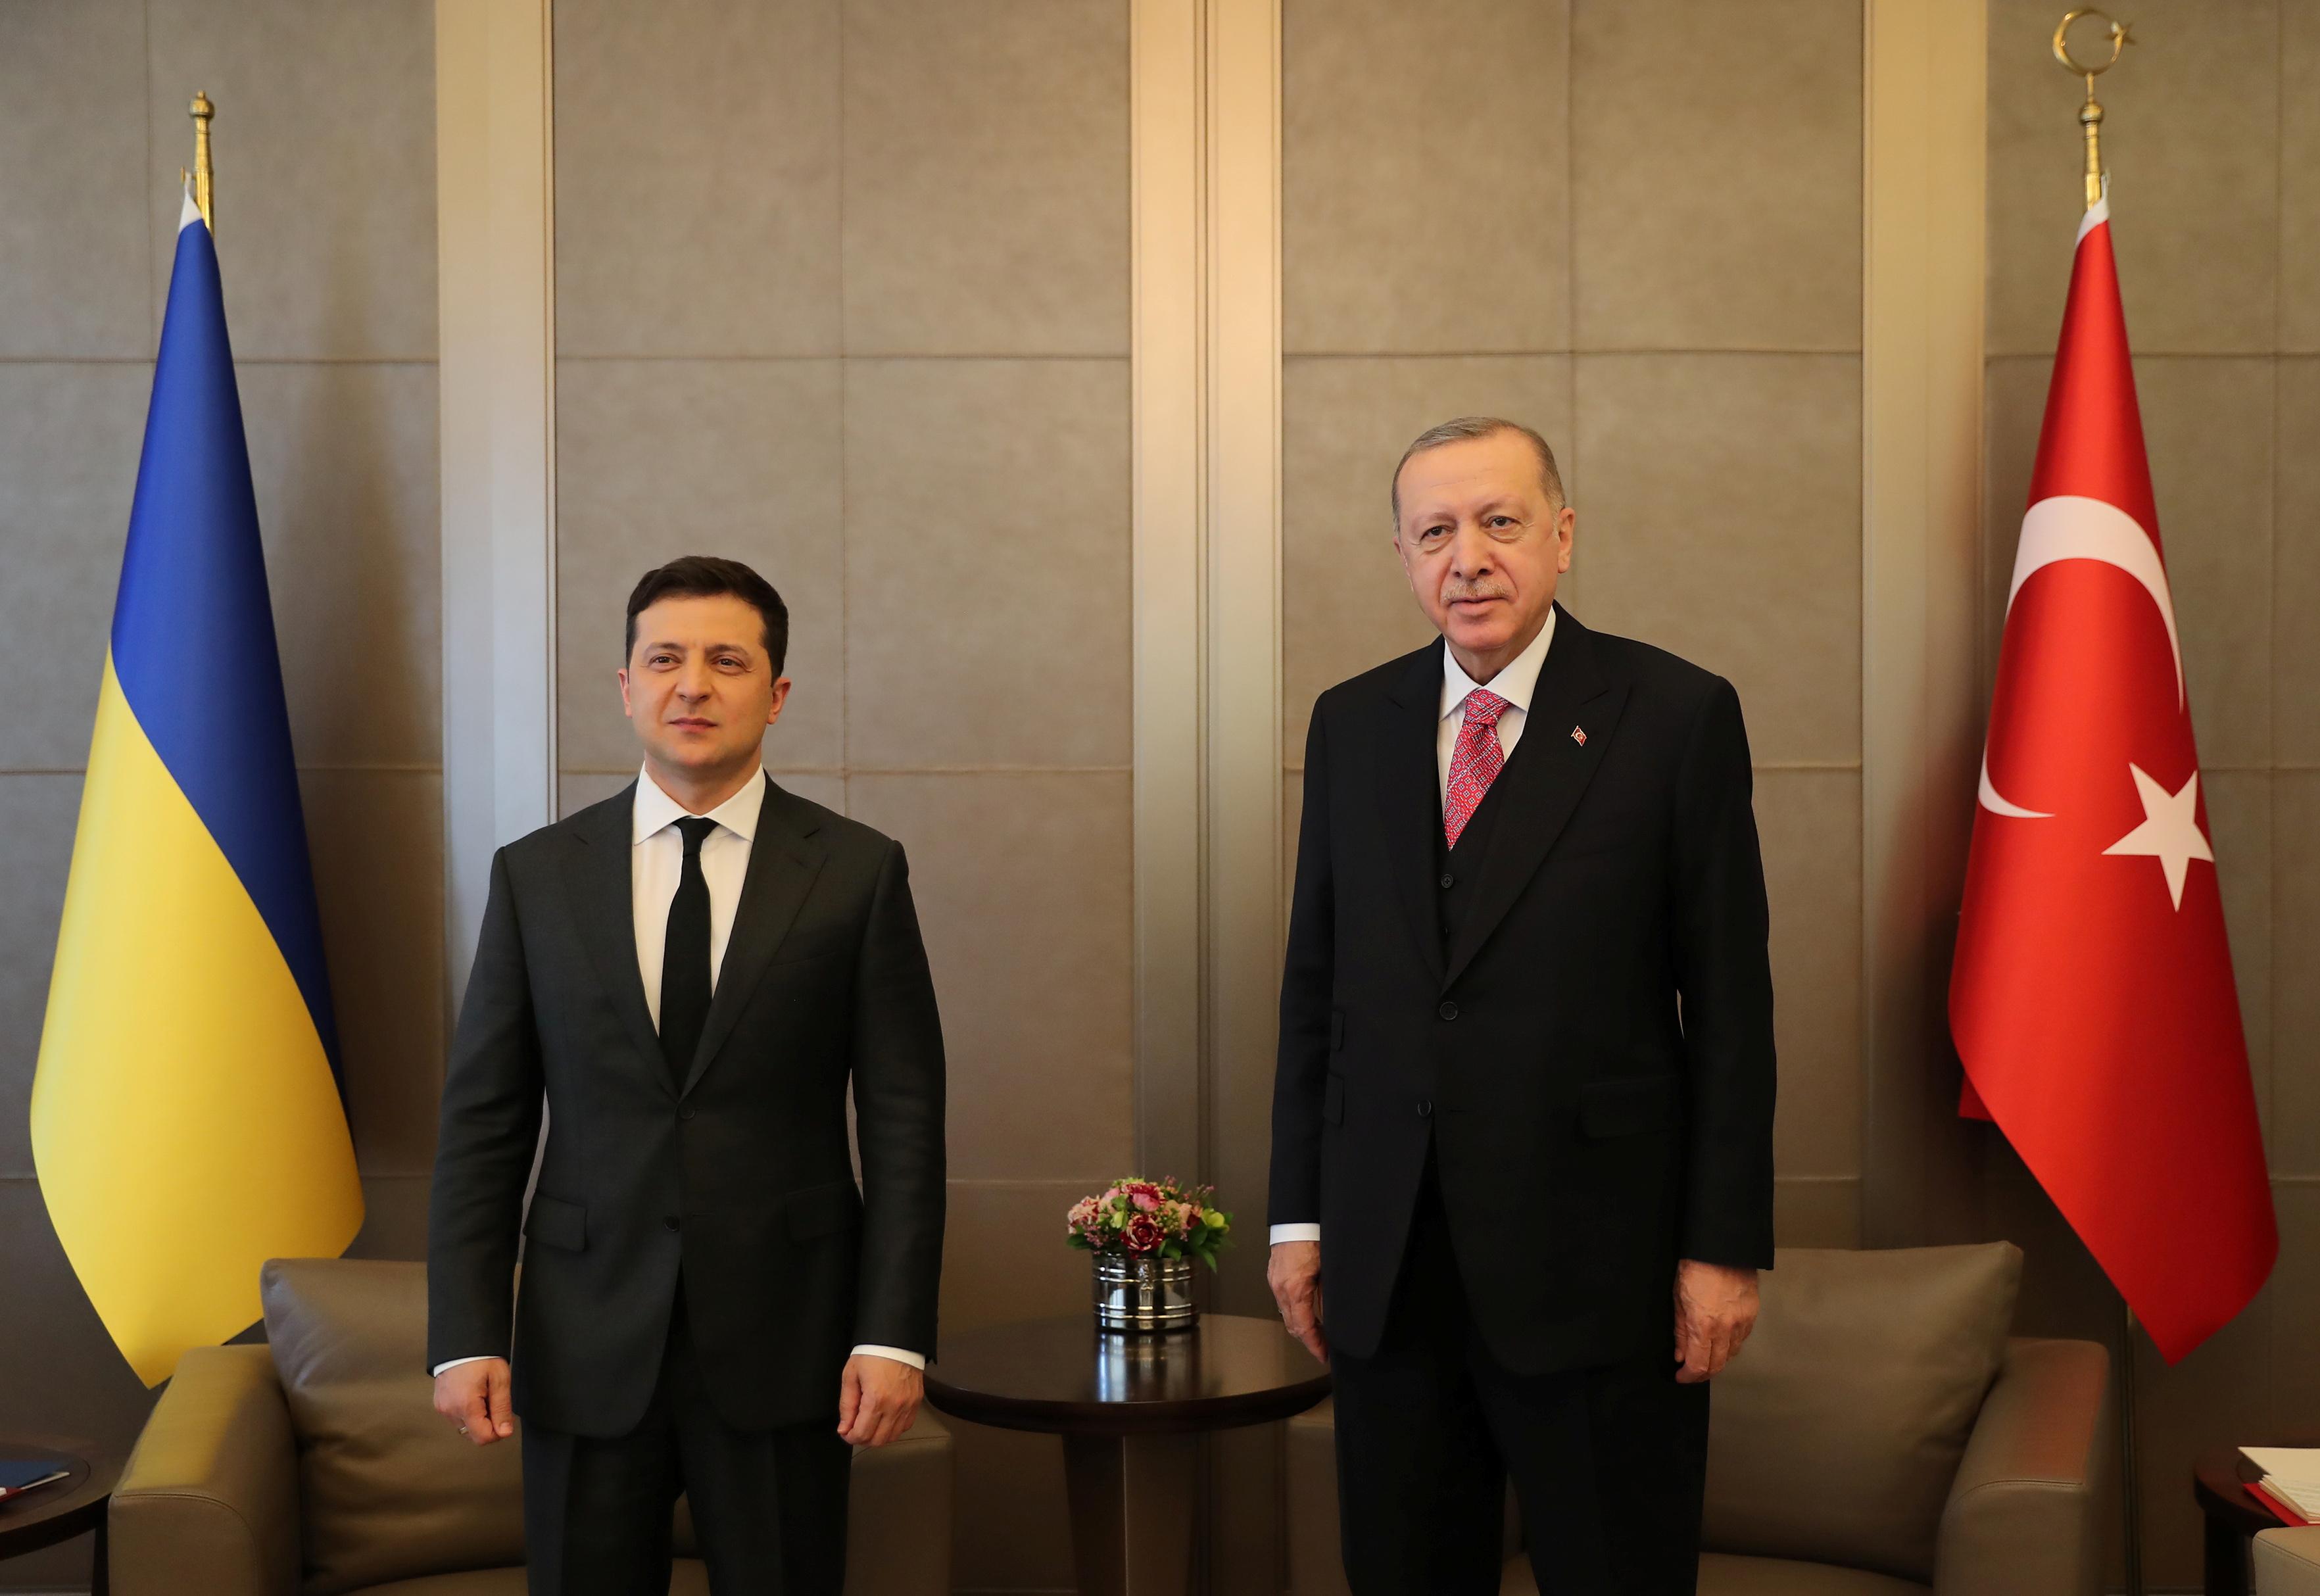 Turkish President Tayyip Erdogan meets with Ukraine's President Volodymyr Zelenskiy in Istanbul, Turkey, April 10, 2021. Murat Cetinmuhurdar/Presidential Press Office/Handout via REUTERS